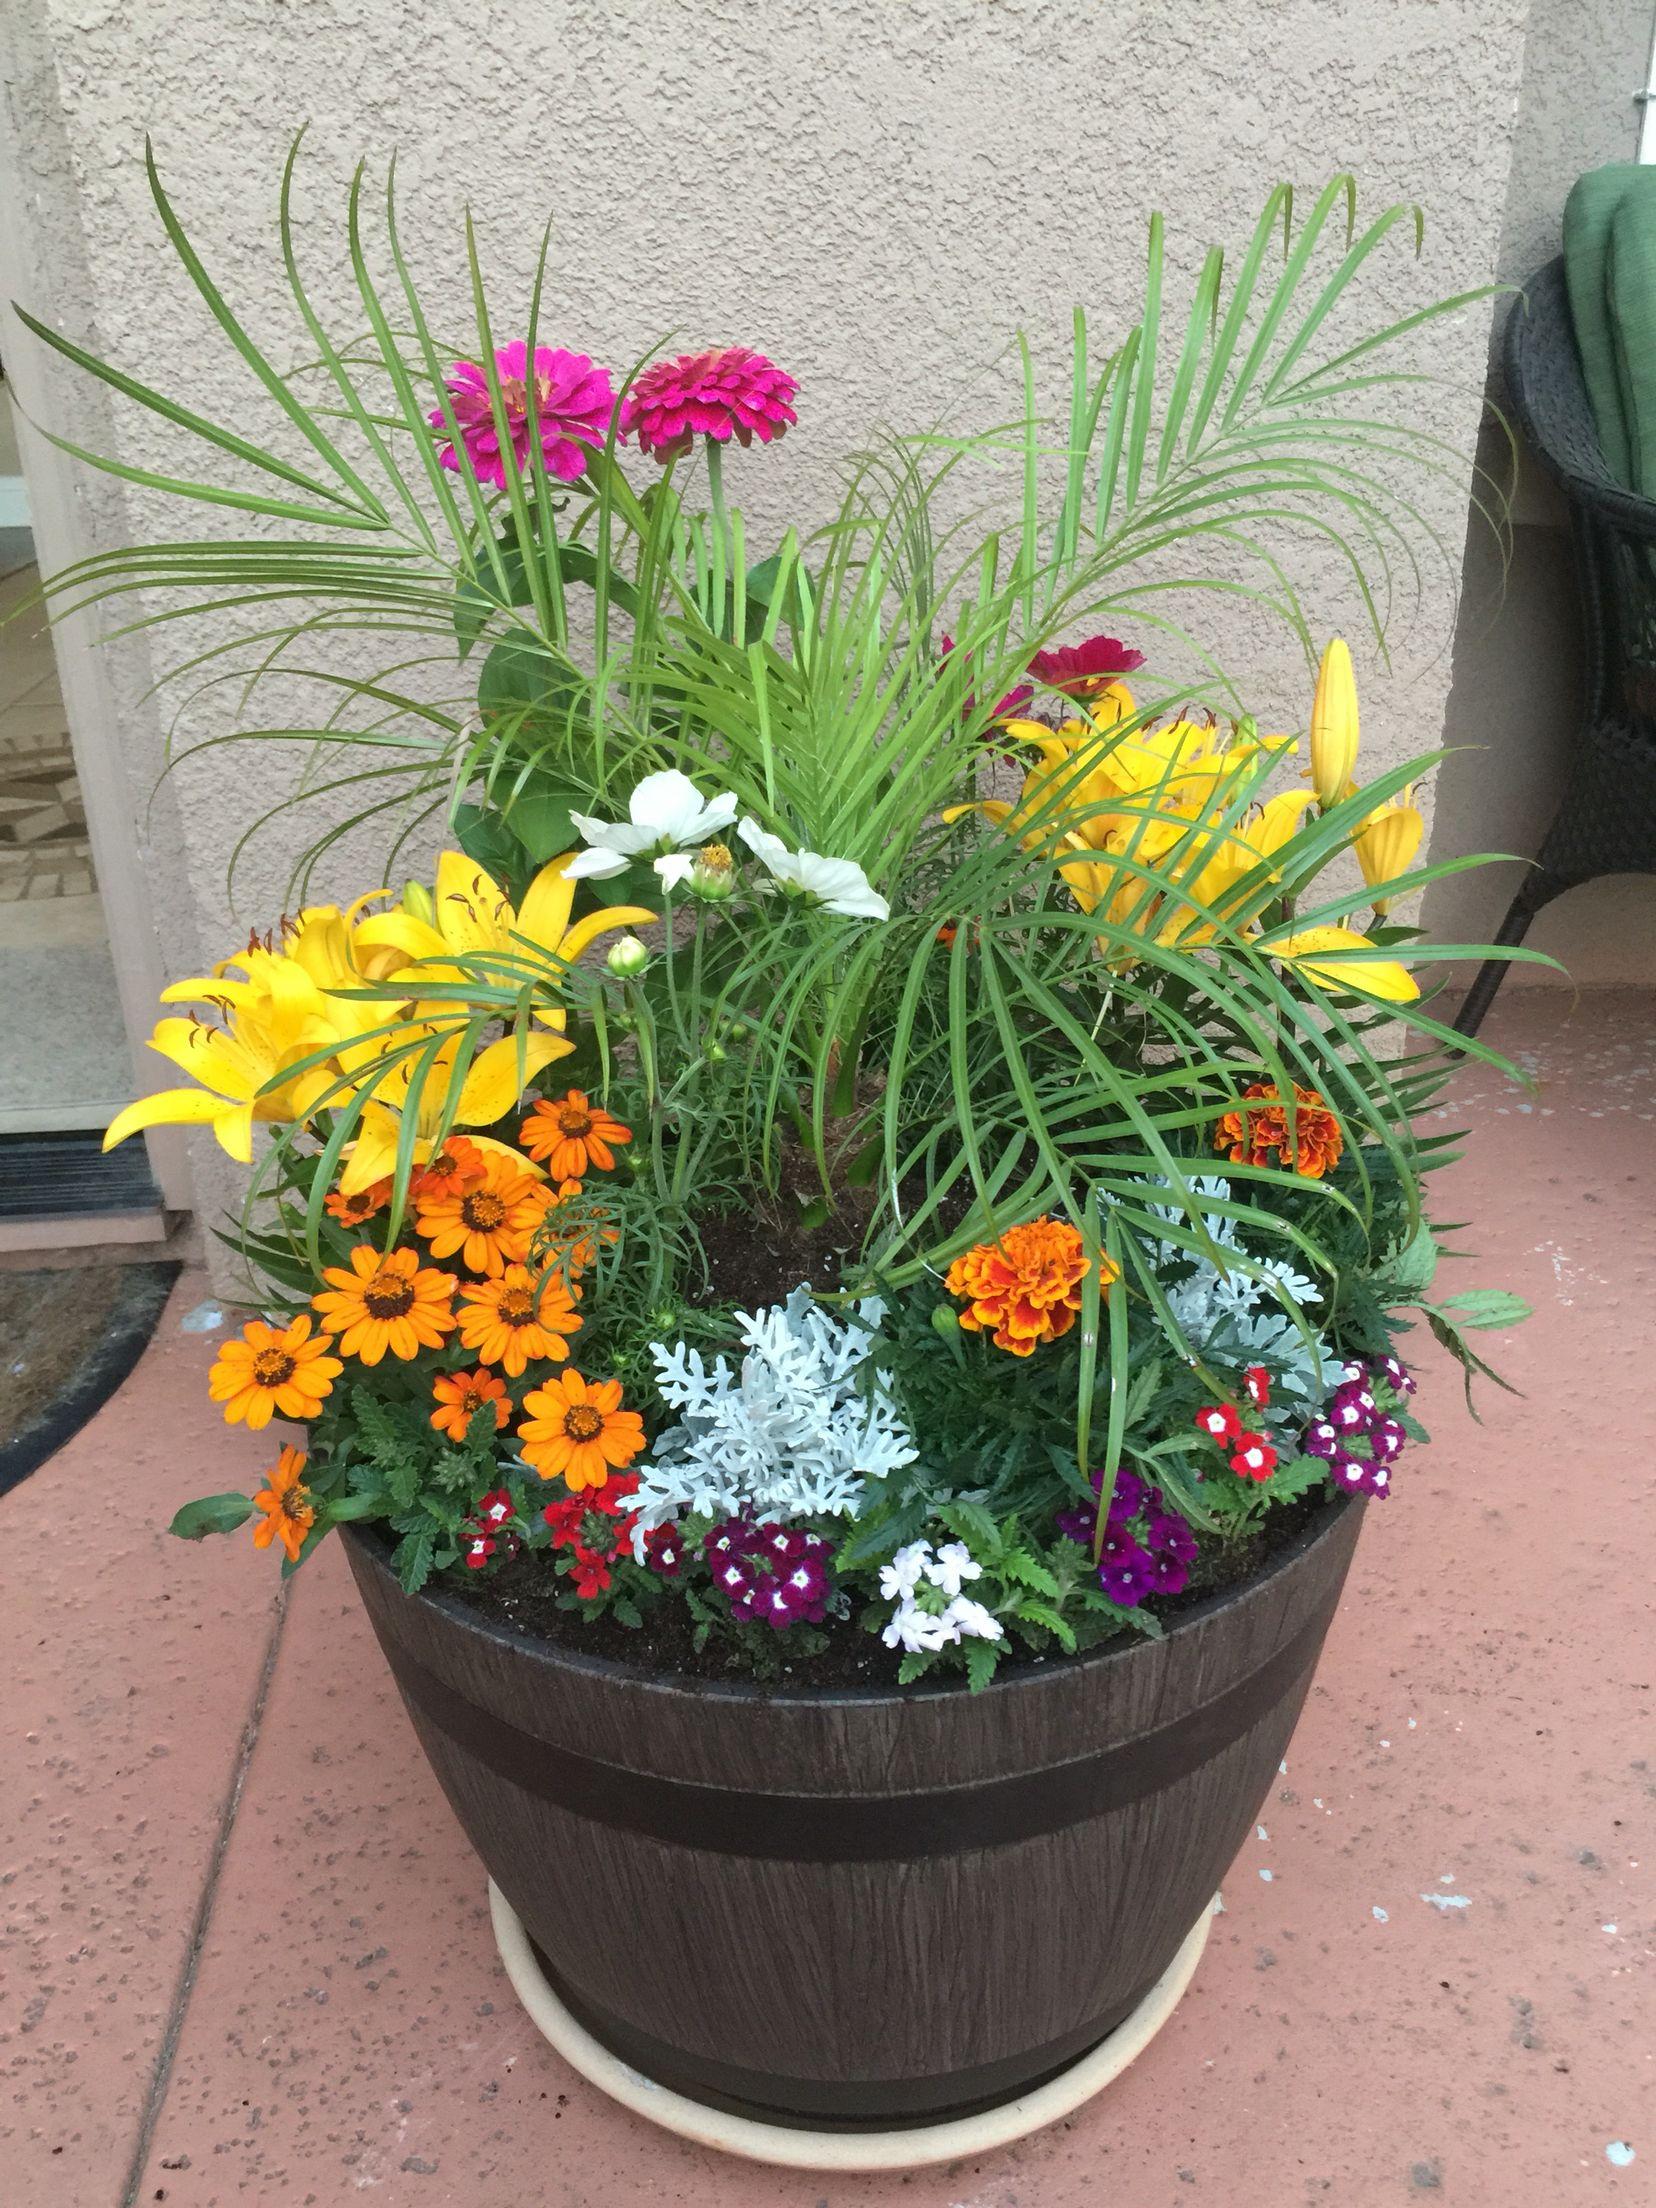 Costco Pot W Perinial Flowers Planter Bo Planters Herb Garden Compost